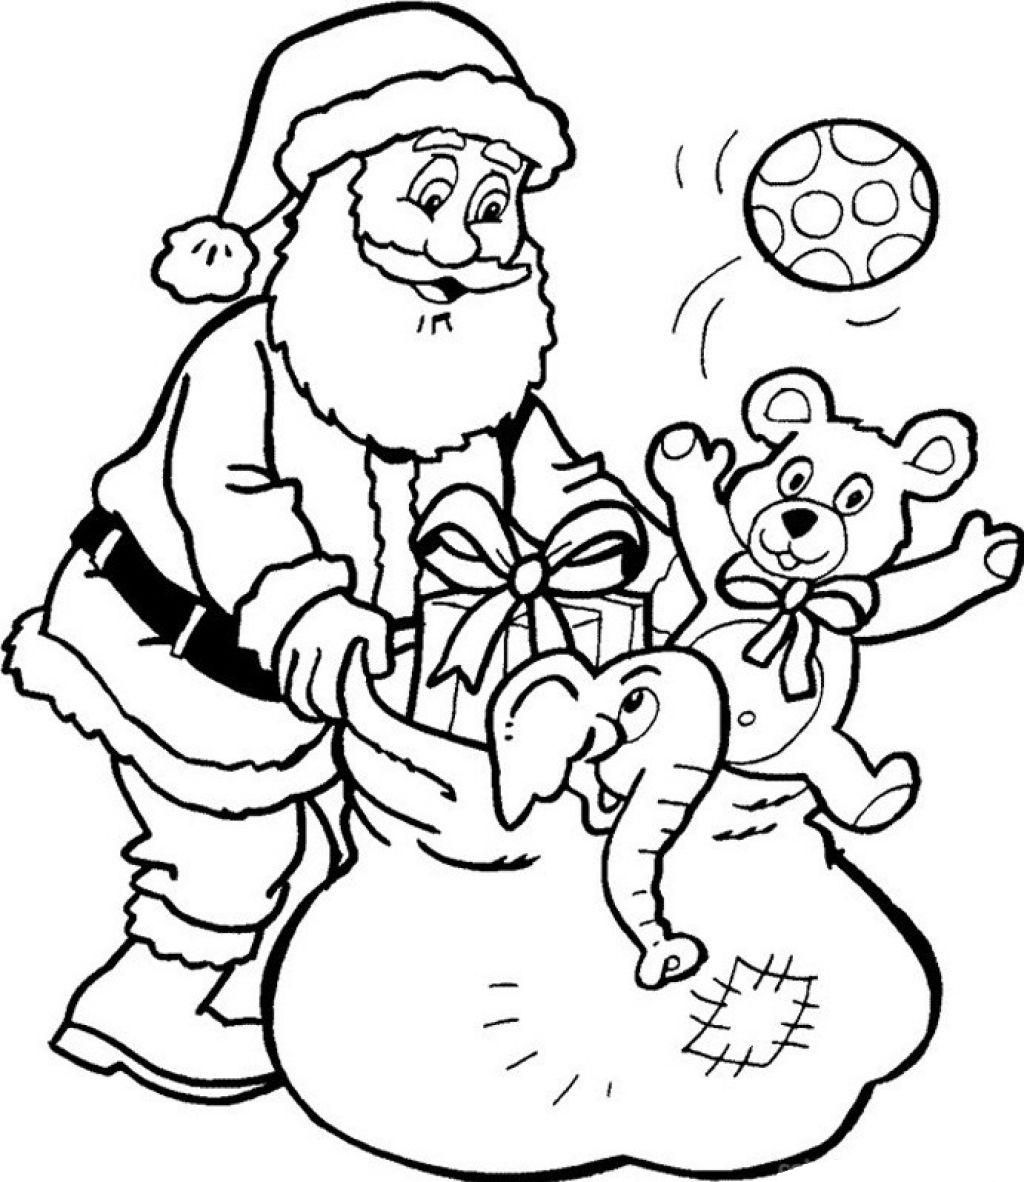 Printable Santa Claus Coloring Page Printable Santa Claus